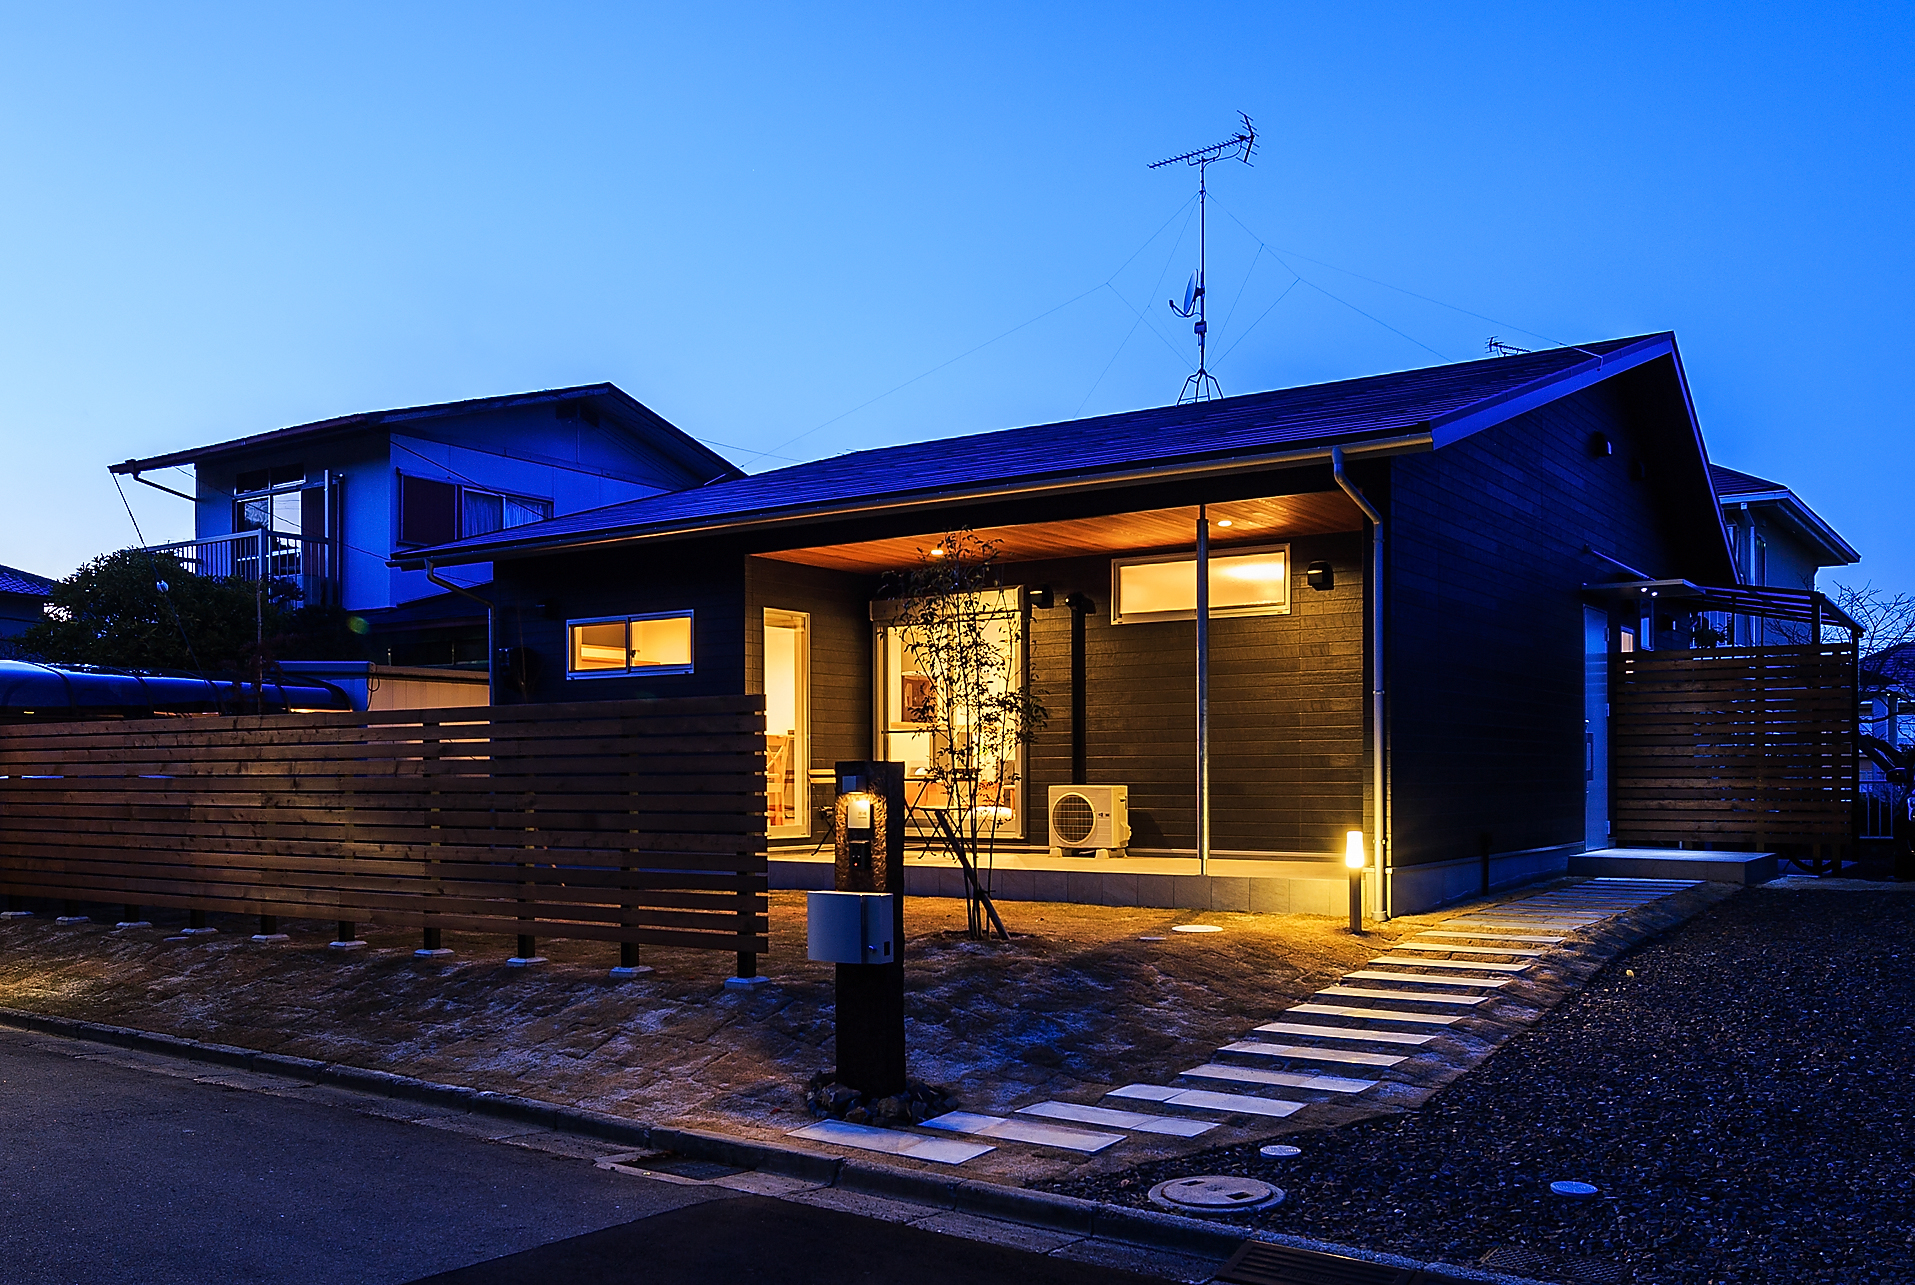 切妻屋根の平屋【奈良市】